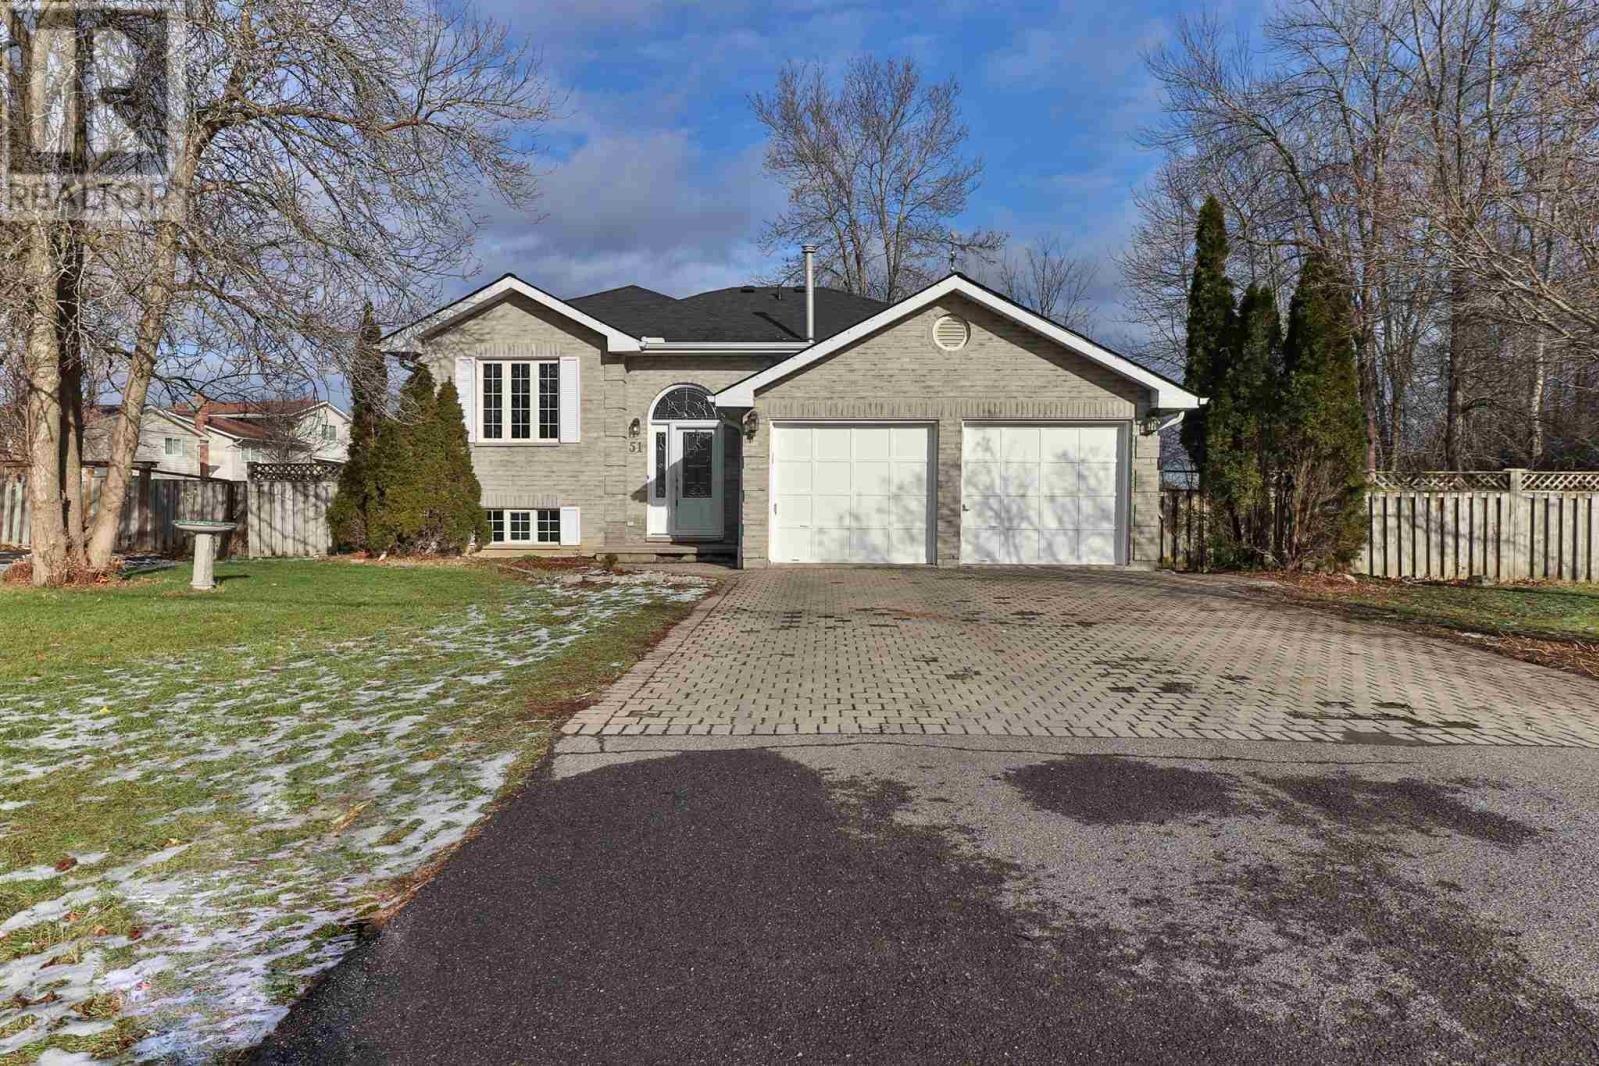 House for sale at 51 Slash Rd Napanee Ontario - MLS: K20006760